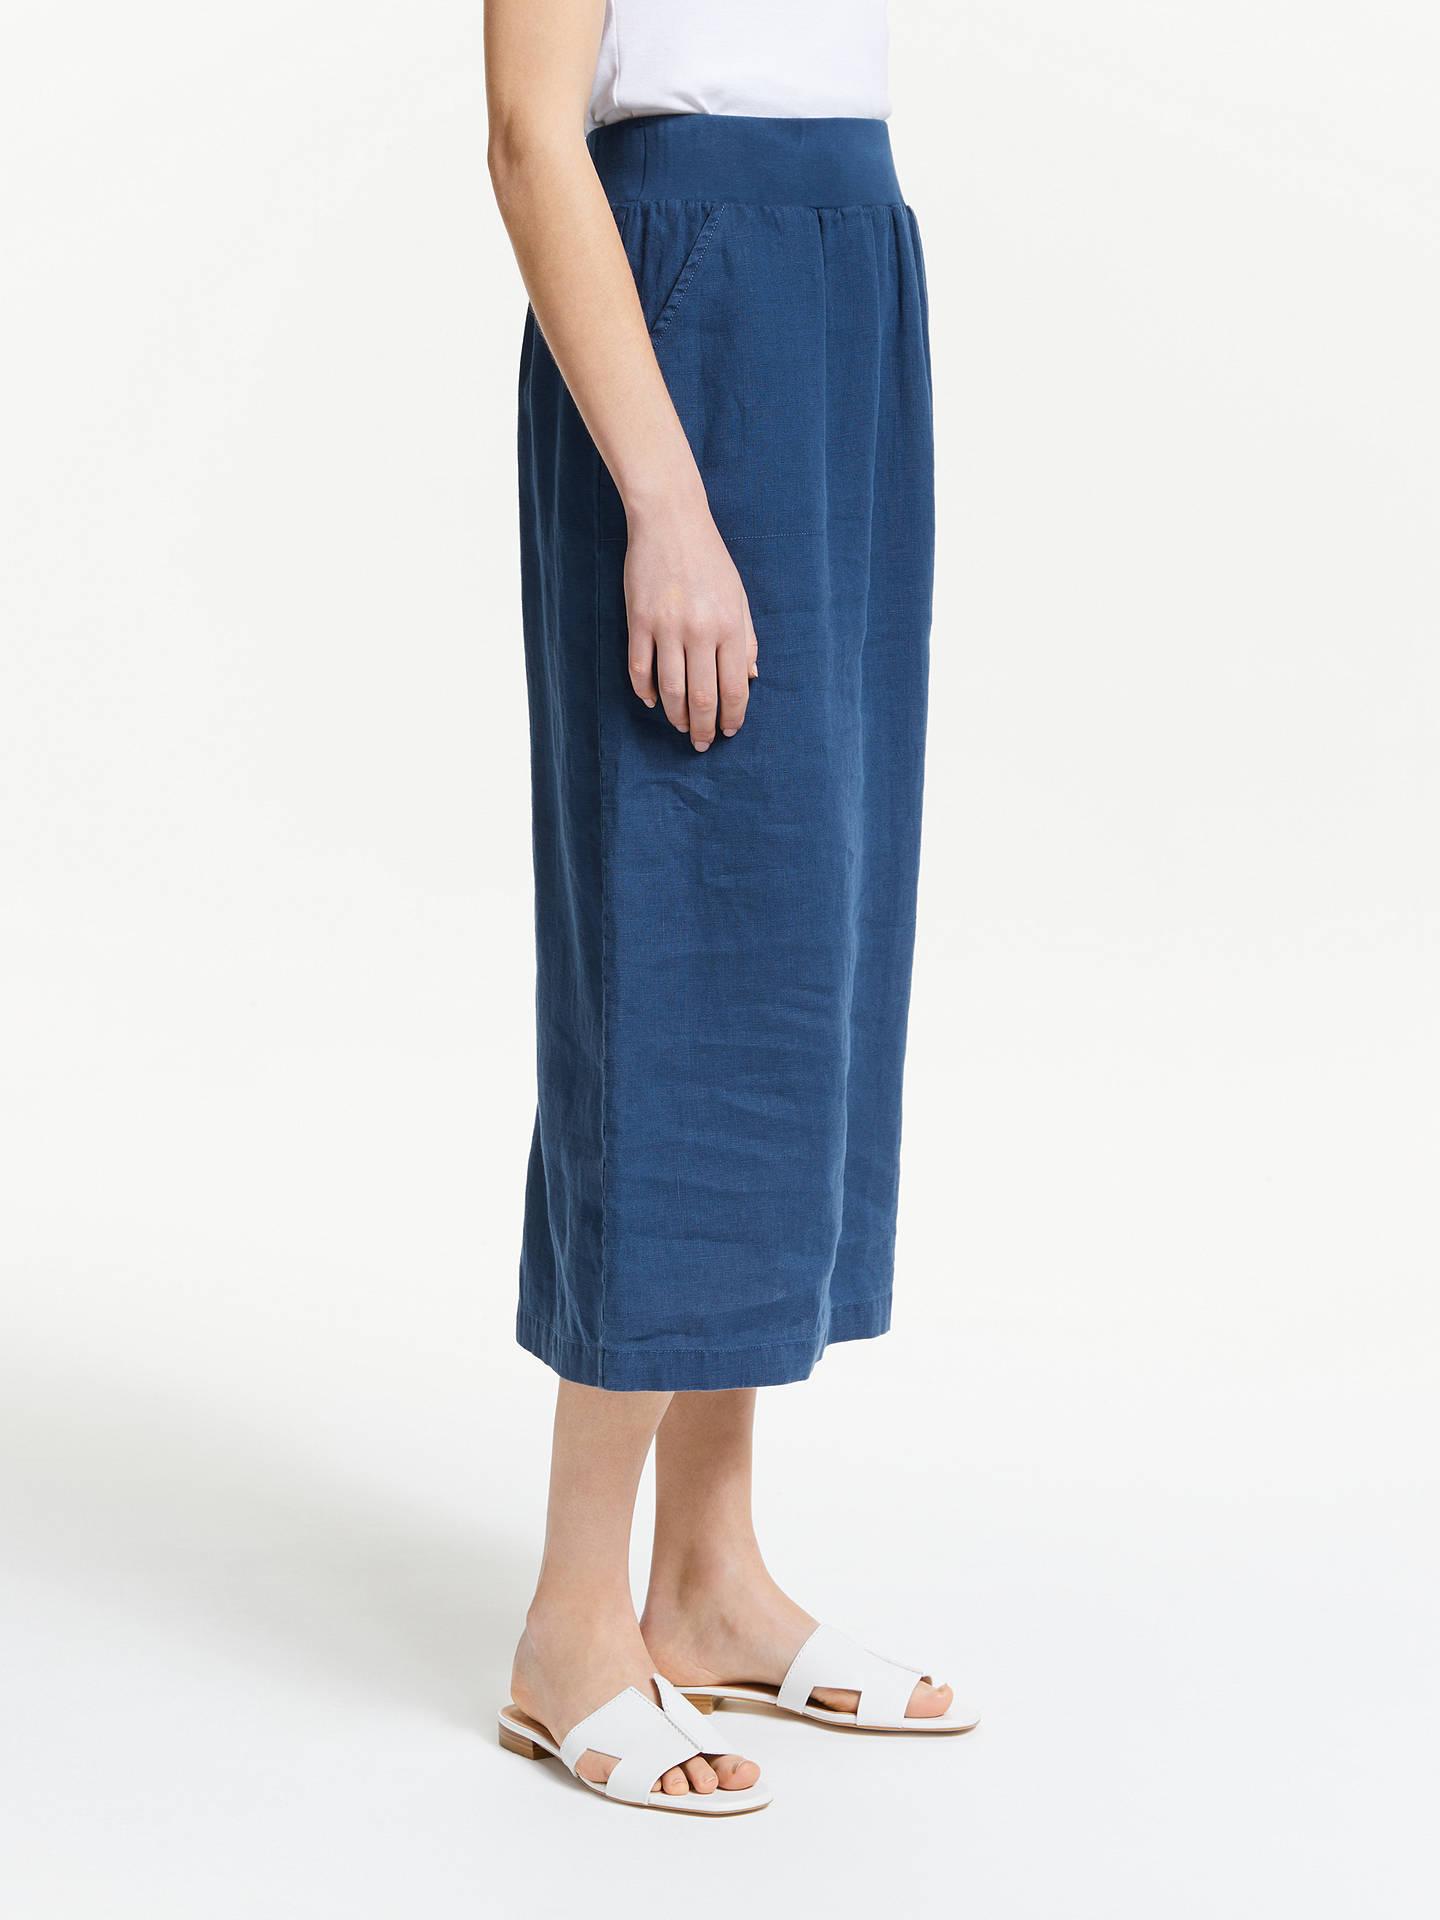 6413f35fe5 ... Buy Seasalt Angel Ray Linen Skirt, Night, 8 Online at johnlewis.com